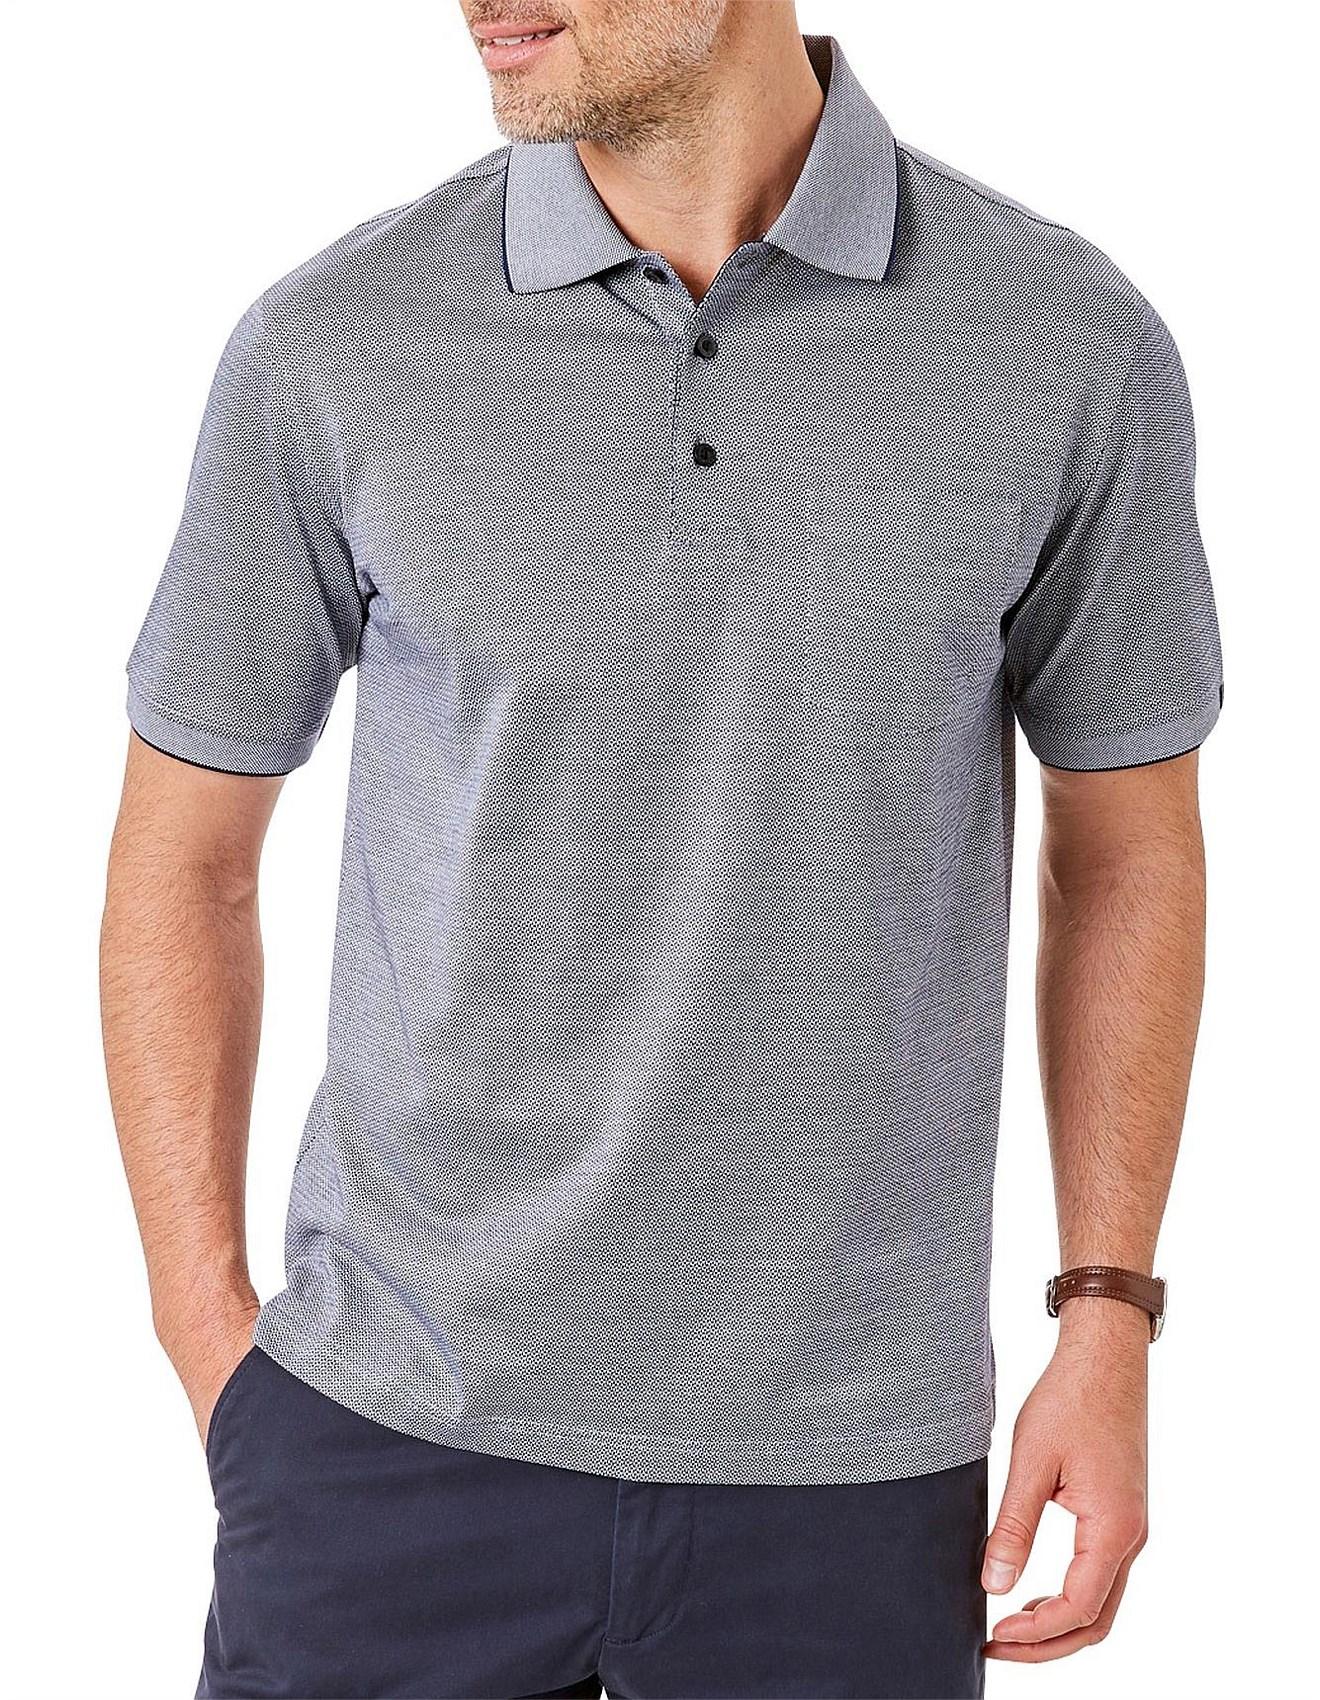 3c49c009 Men's Polo Shirts Sale | Buy Polo Shirts Online | David Jones - GEO JACQUARD  MERCERISED POLO